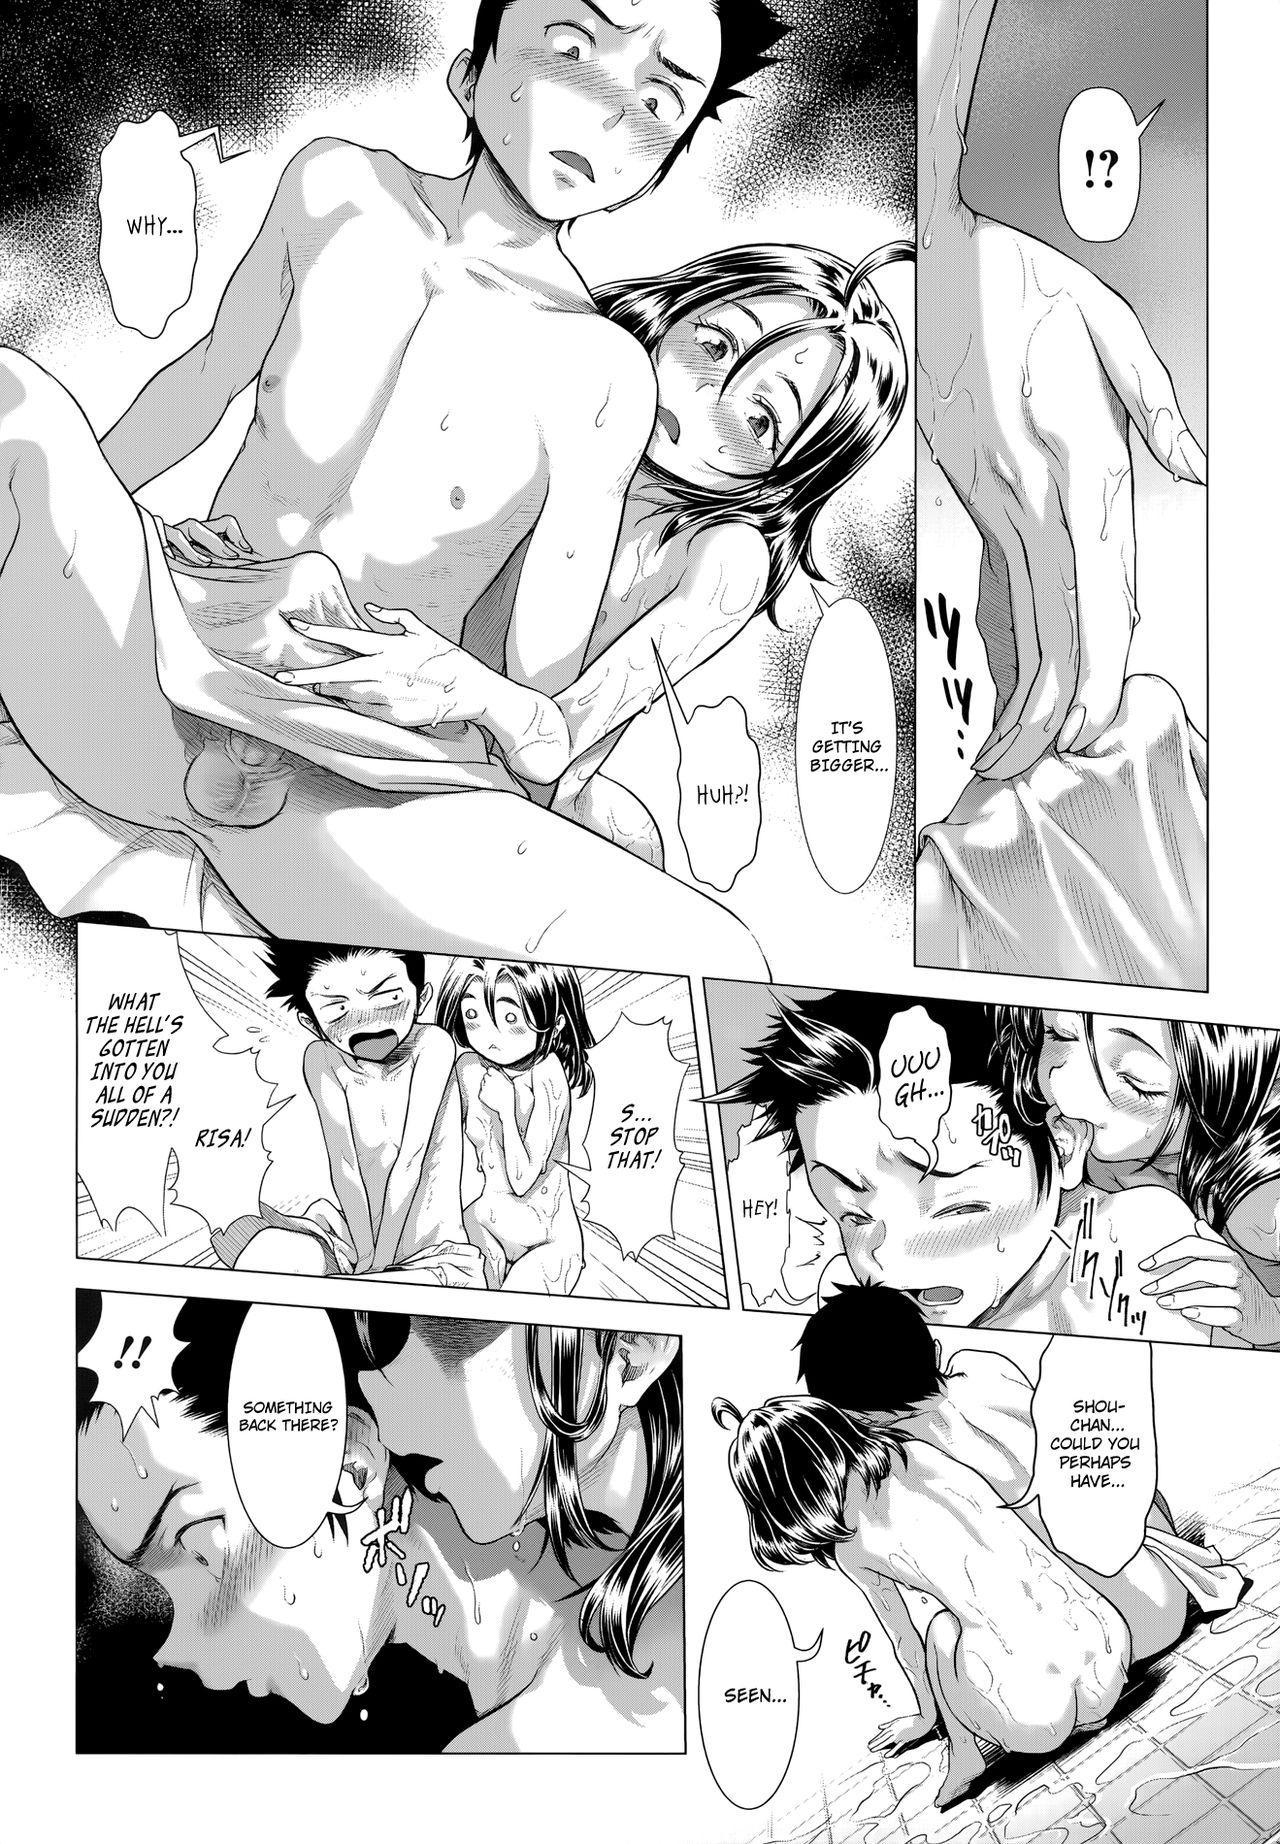 [Sannyuutei Shinta] Chinpotsuki Ijimerarekko | «Dickgirl!», The Bullying Story - Ch. 1-4 [English] [34th squad] 75